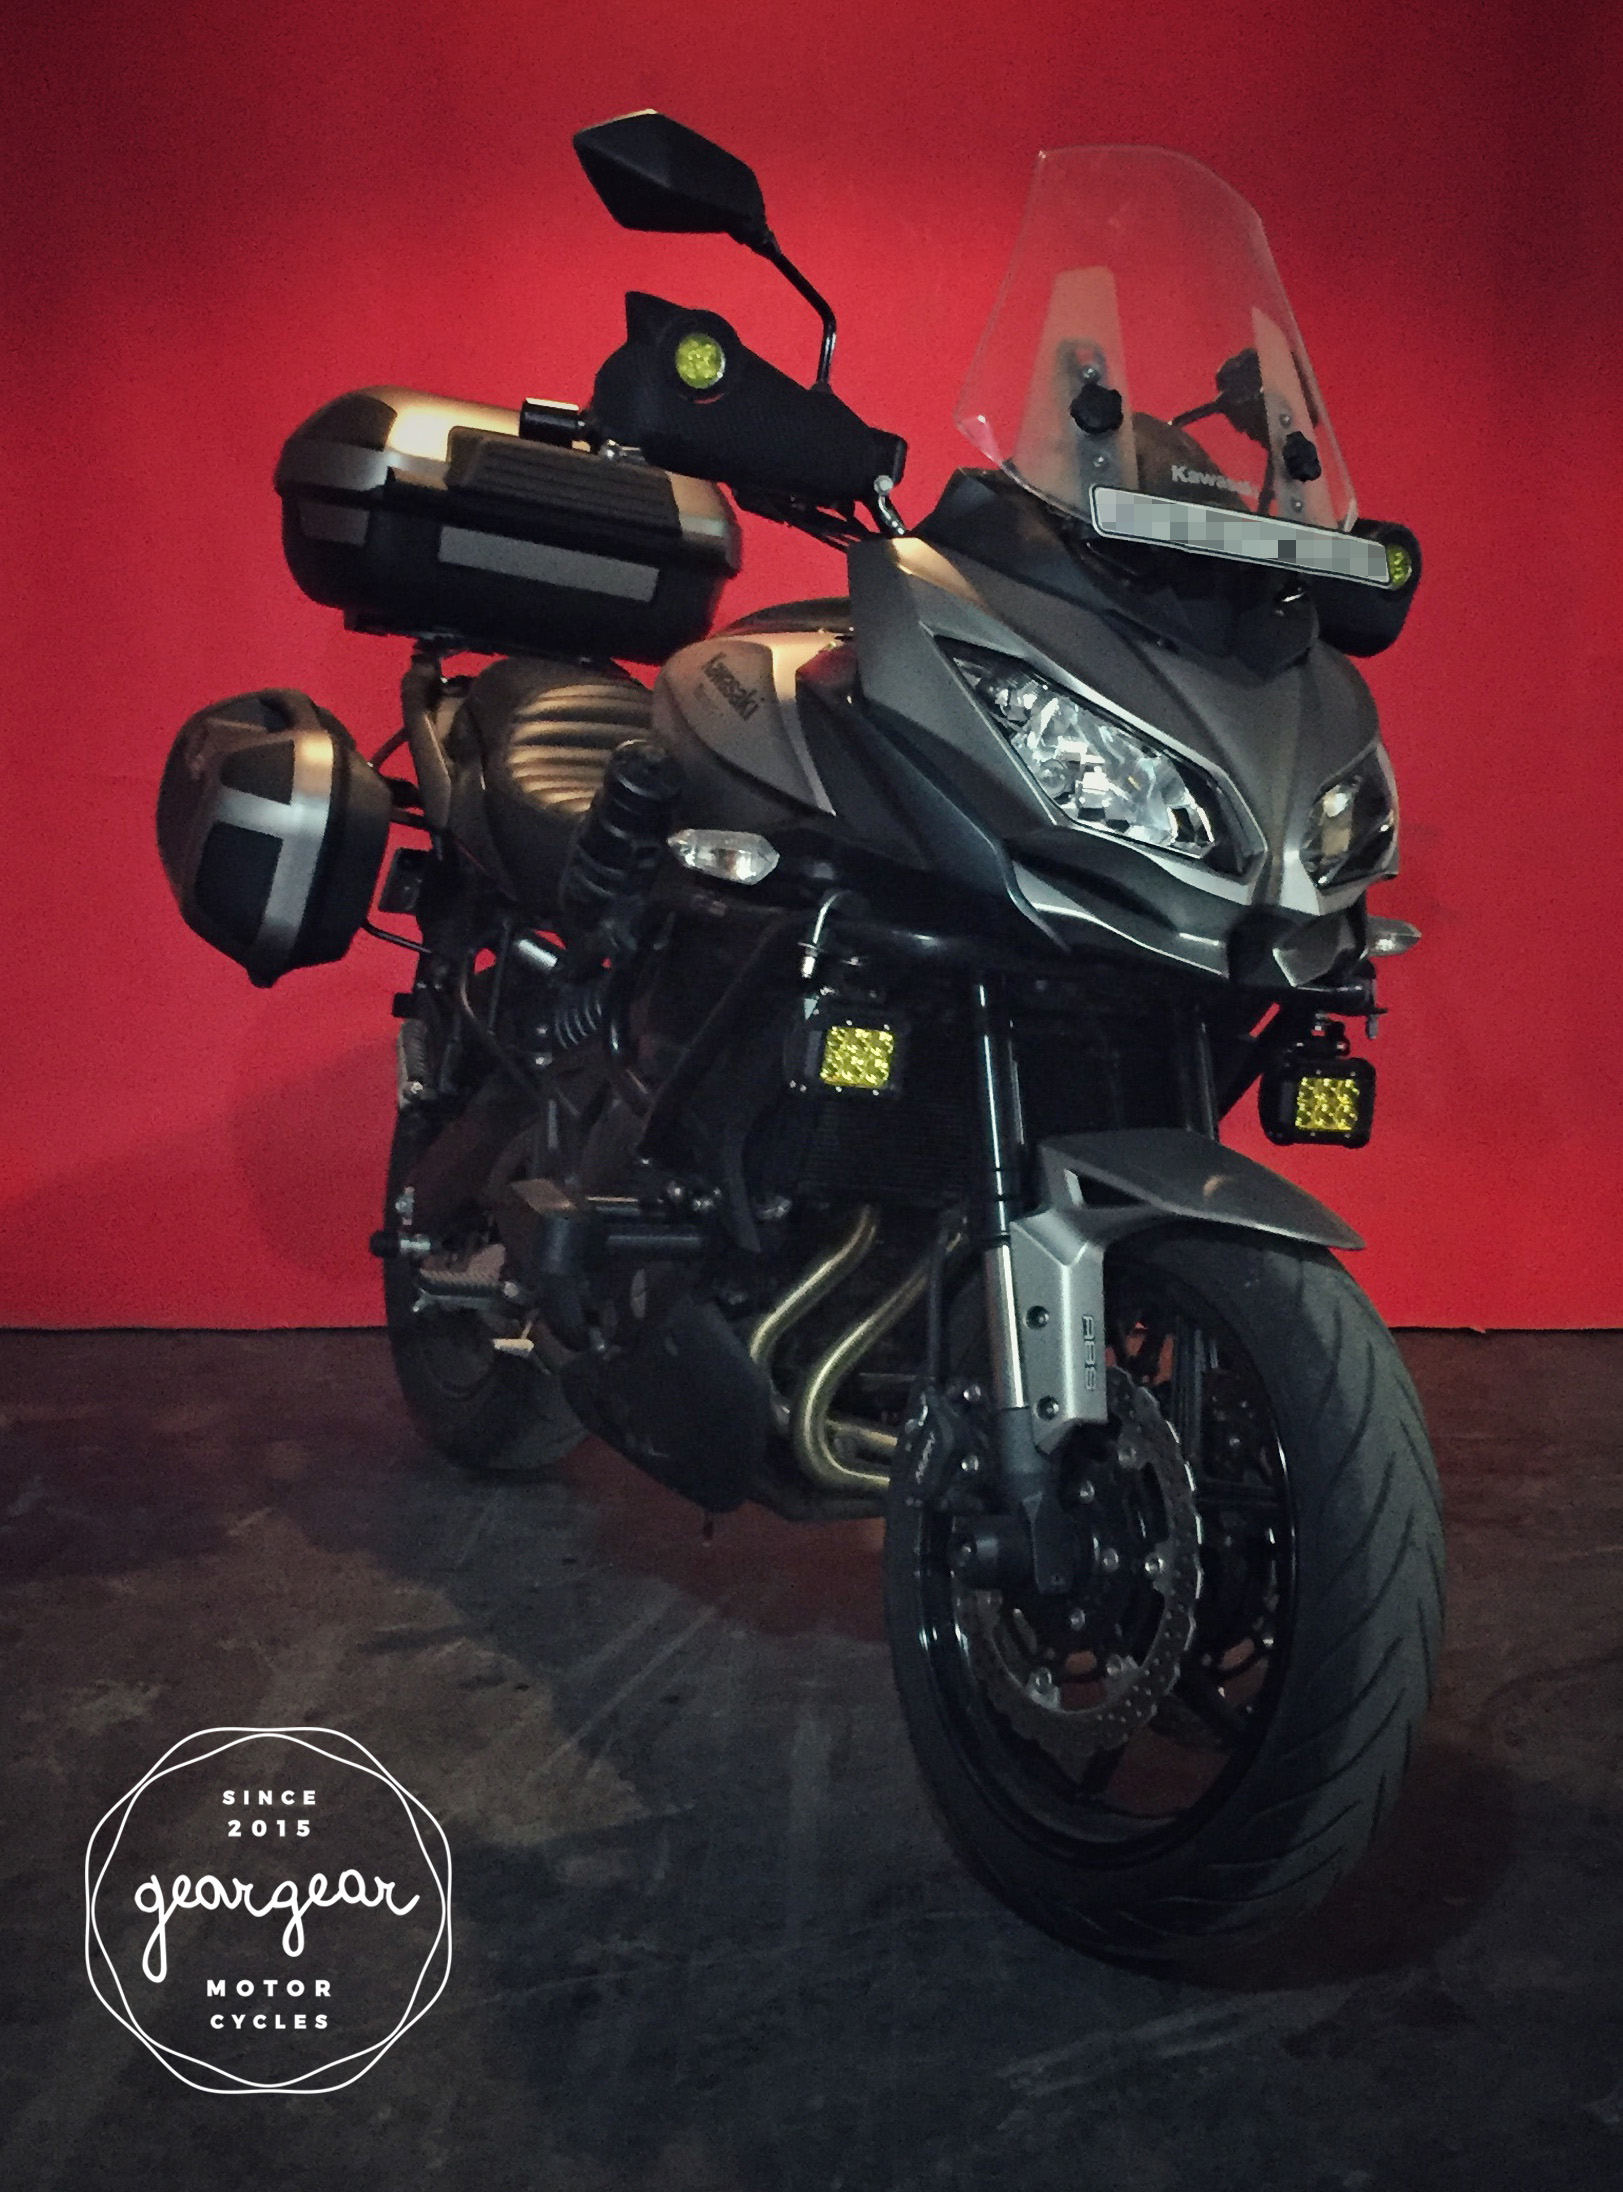 Photo Custom Kawasaki Versys 650 For Touring By Gear